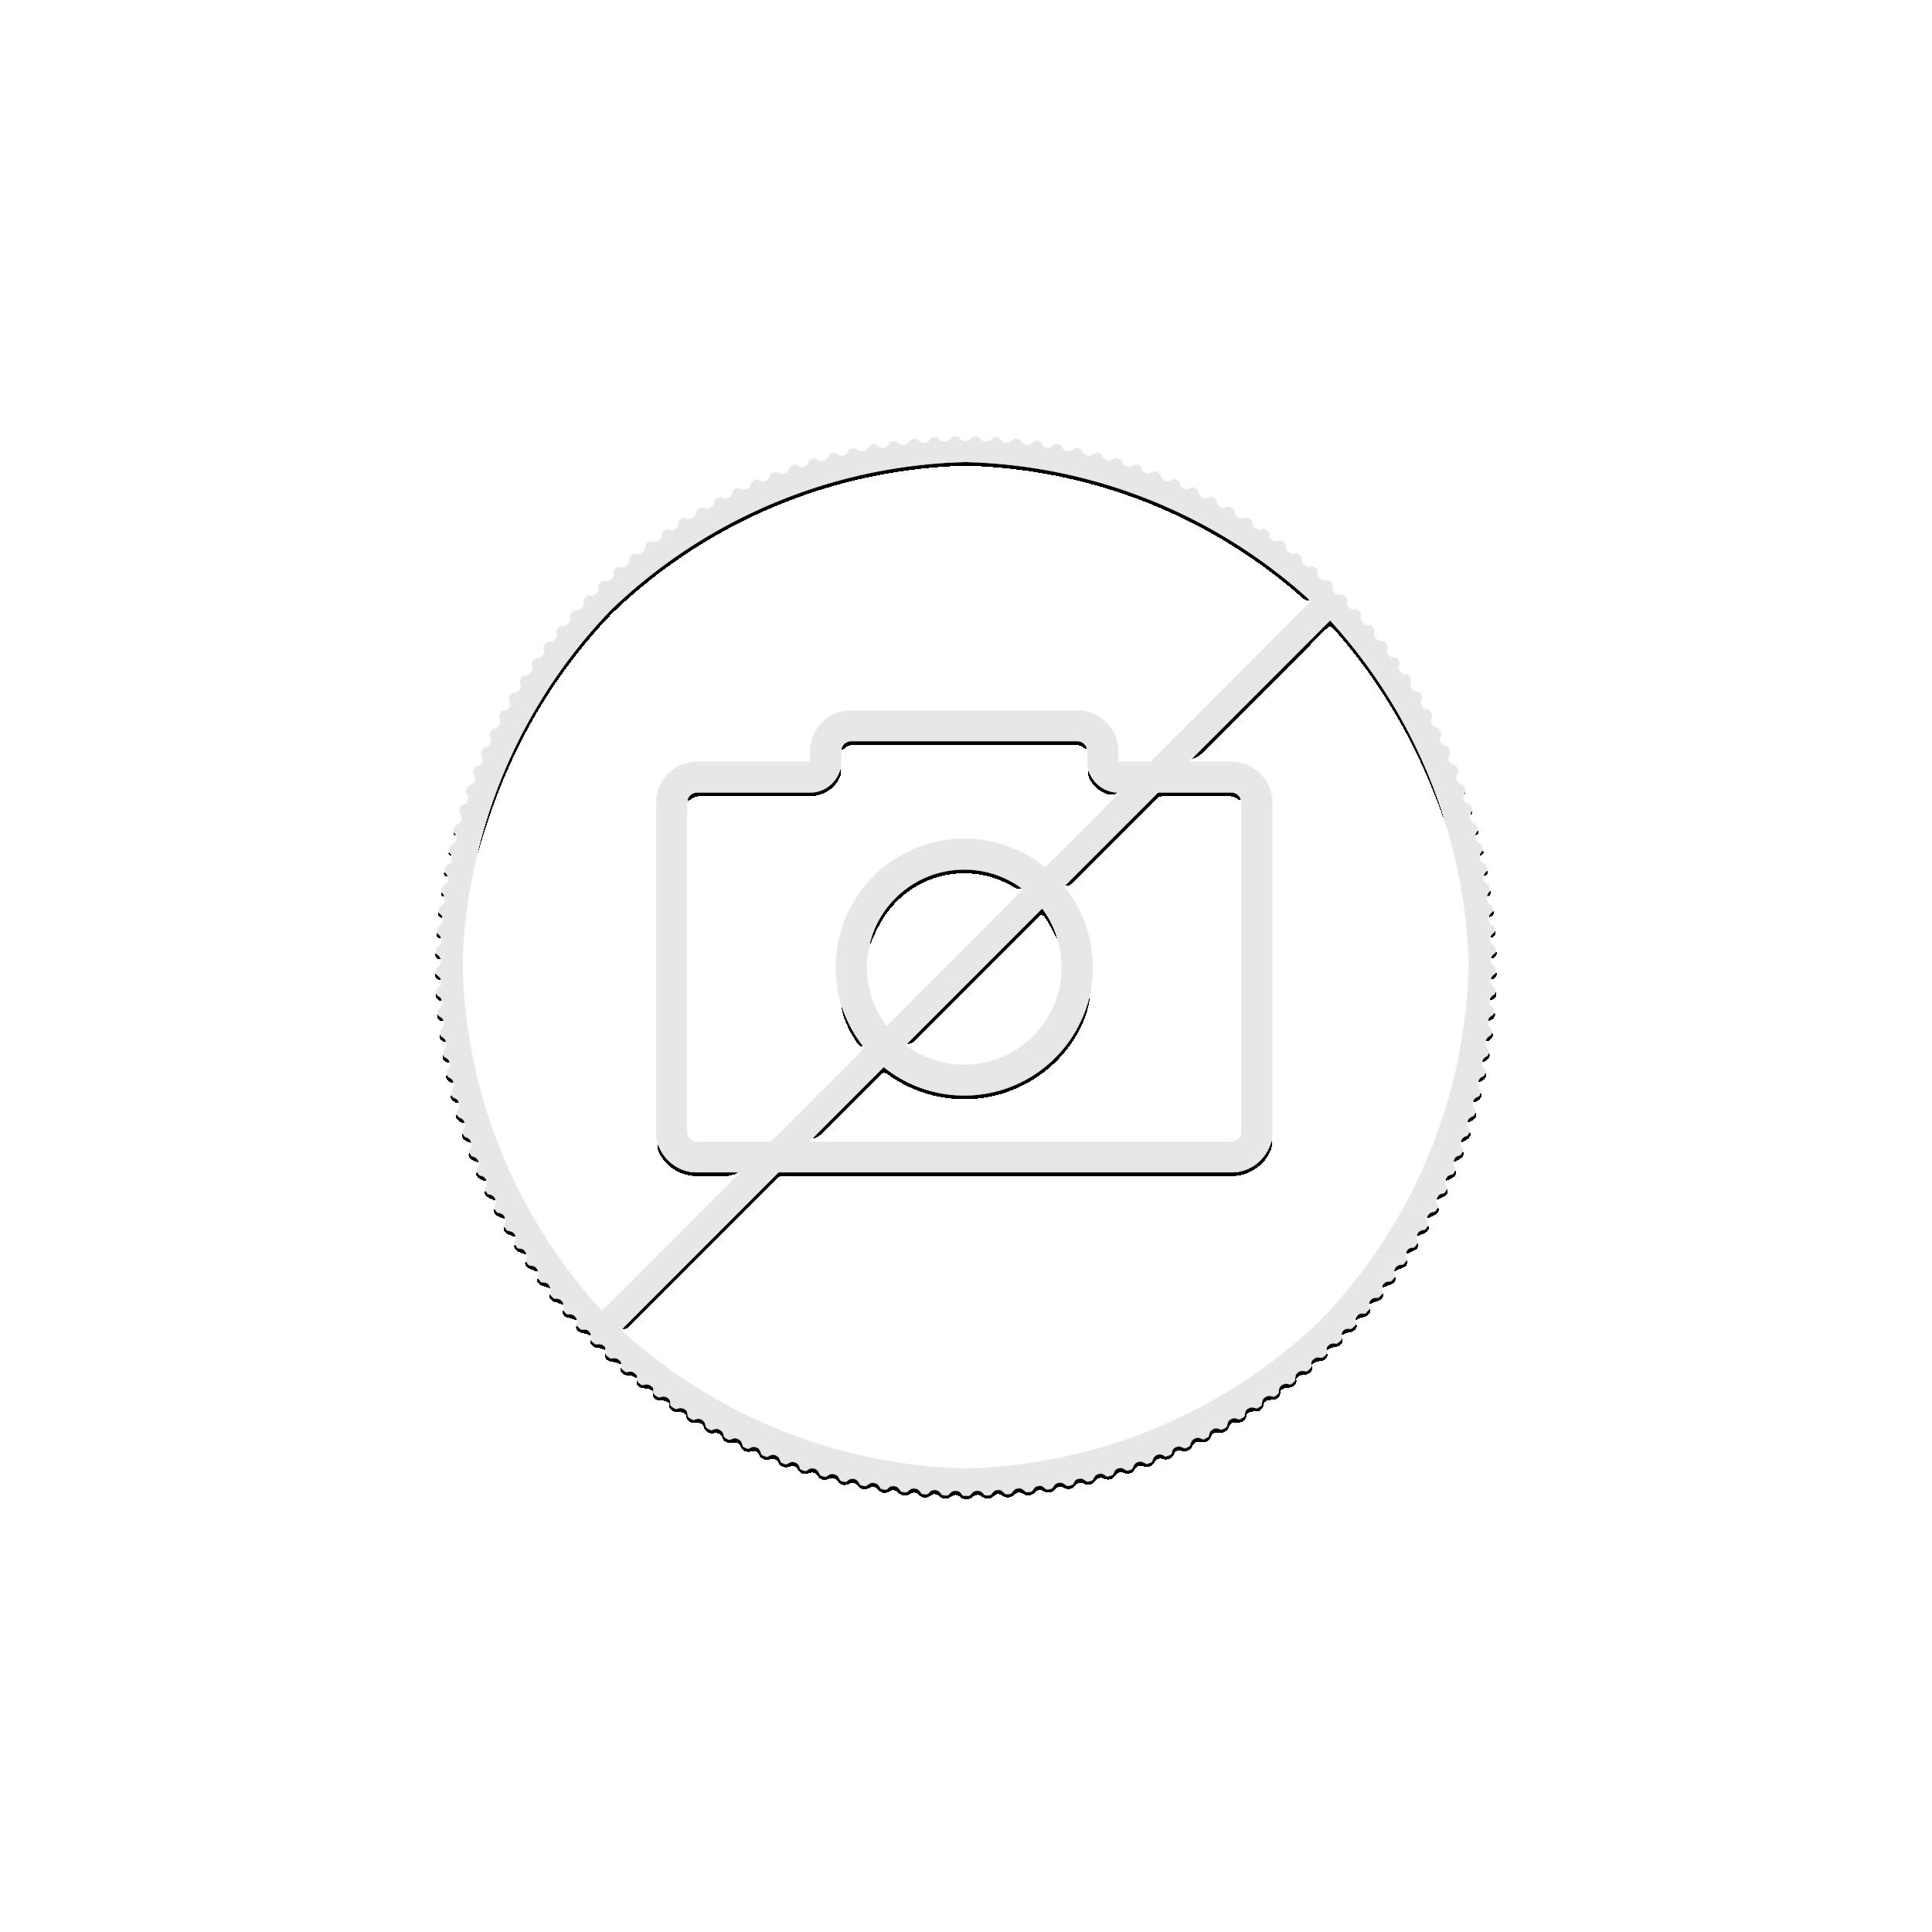 Maple Leaf zilver jubileum munt in kleur